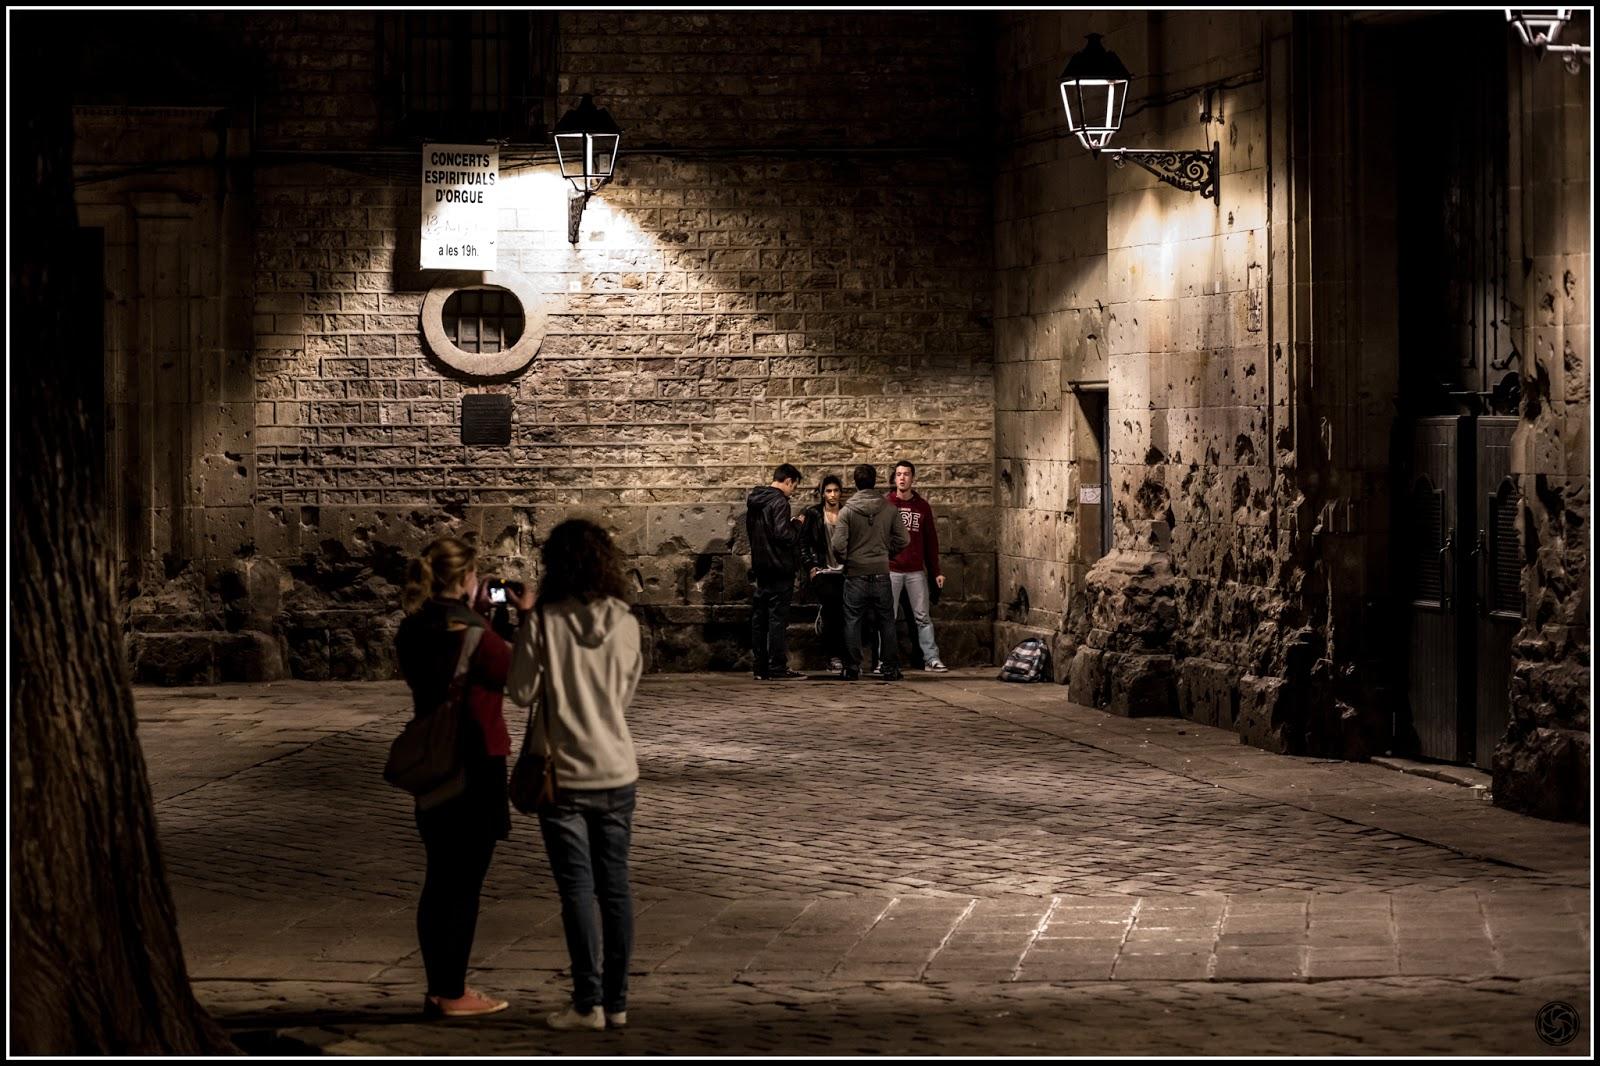 Barcelona, Las Crónicas de Neri: Rincón de confabuladores